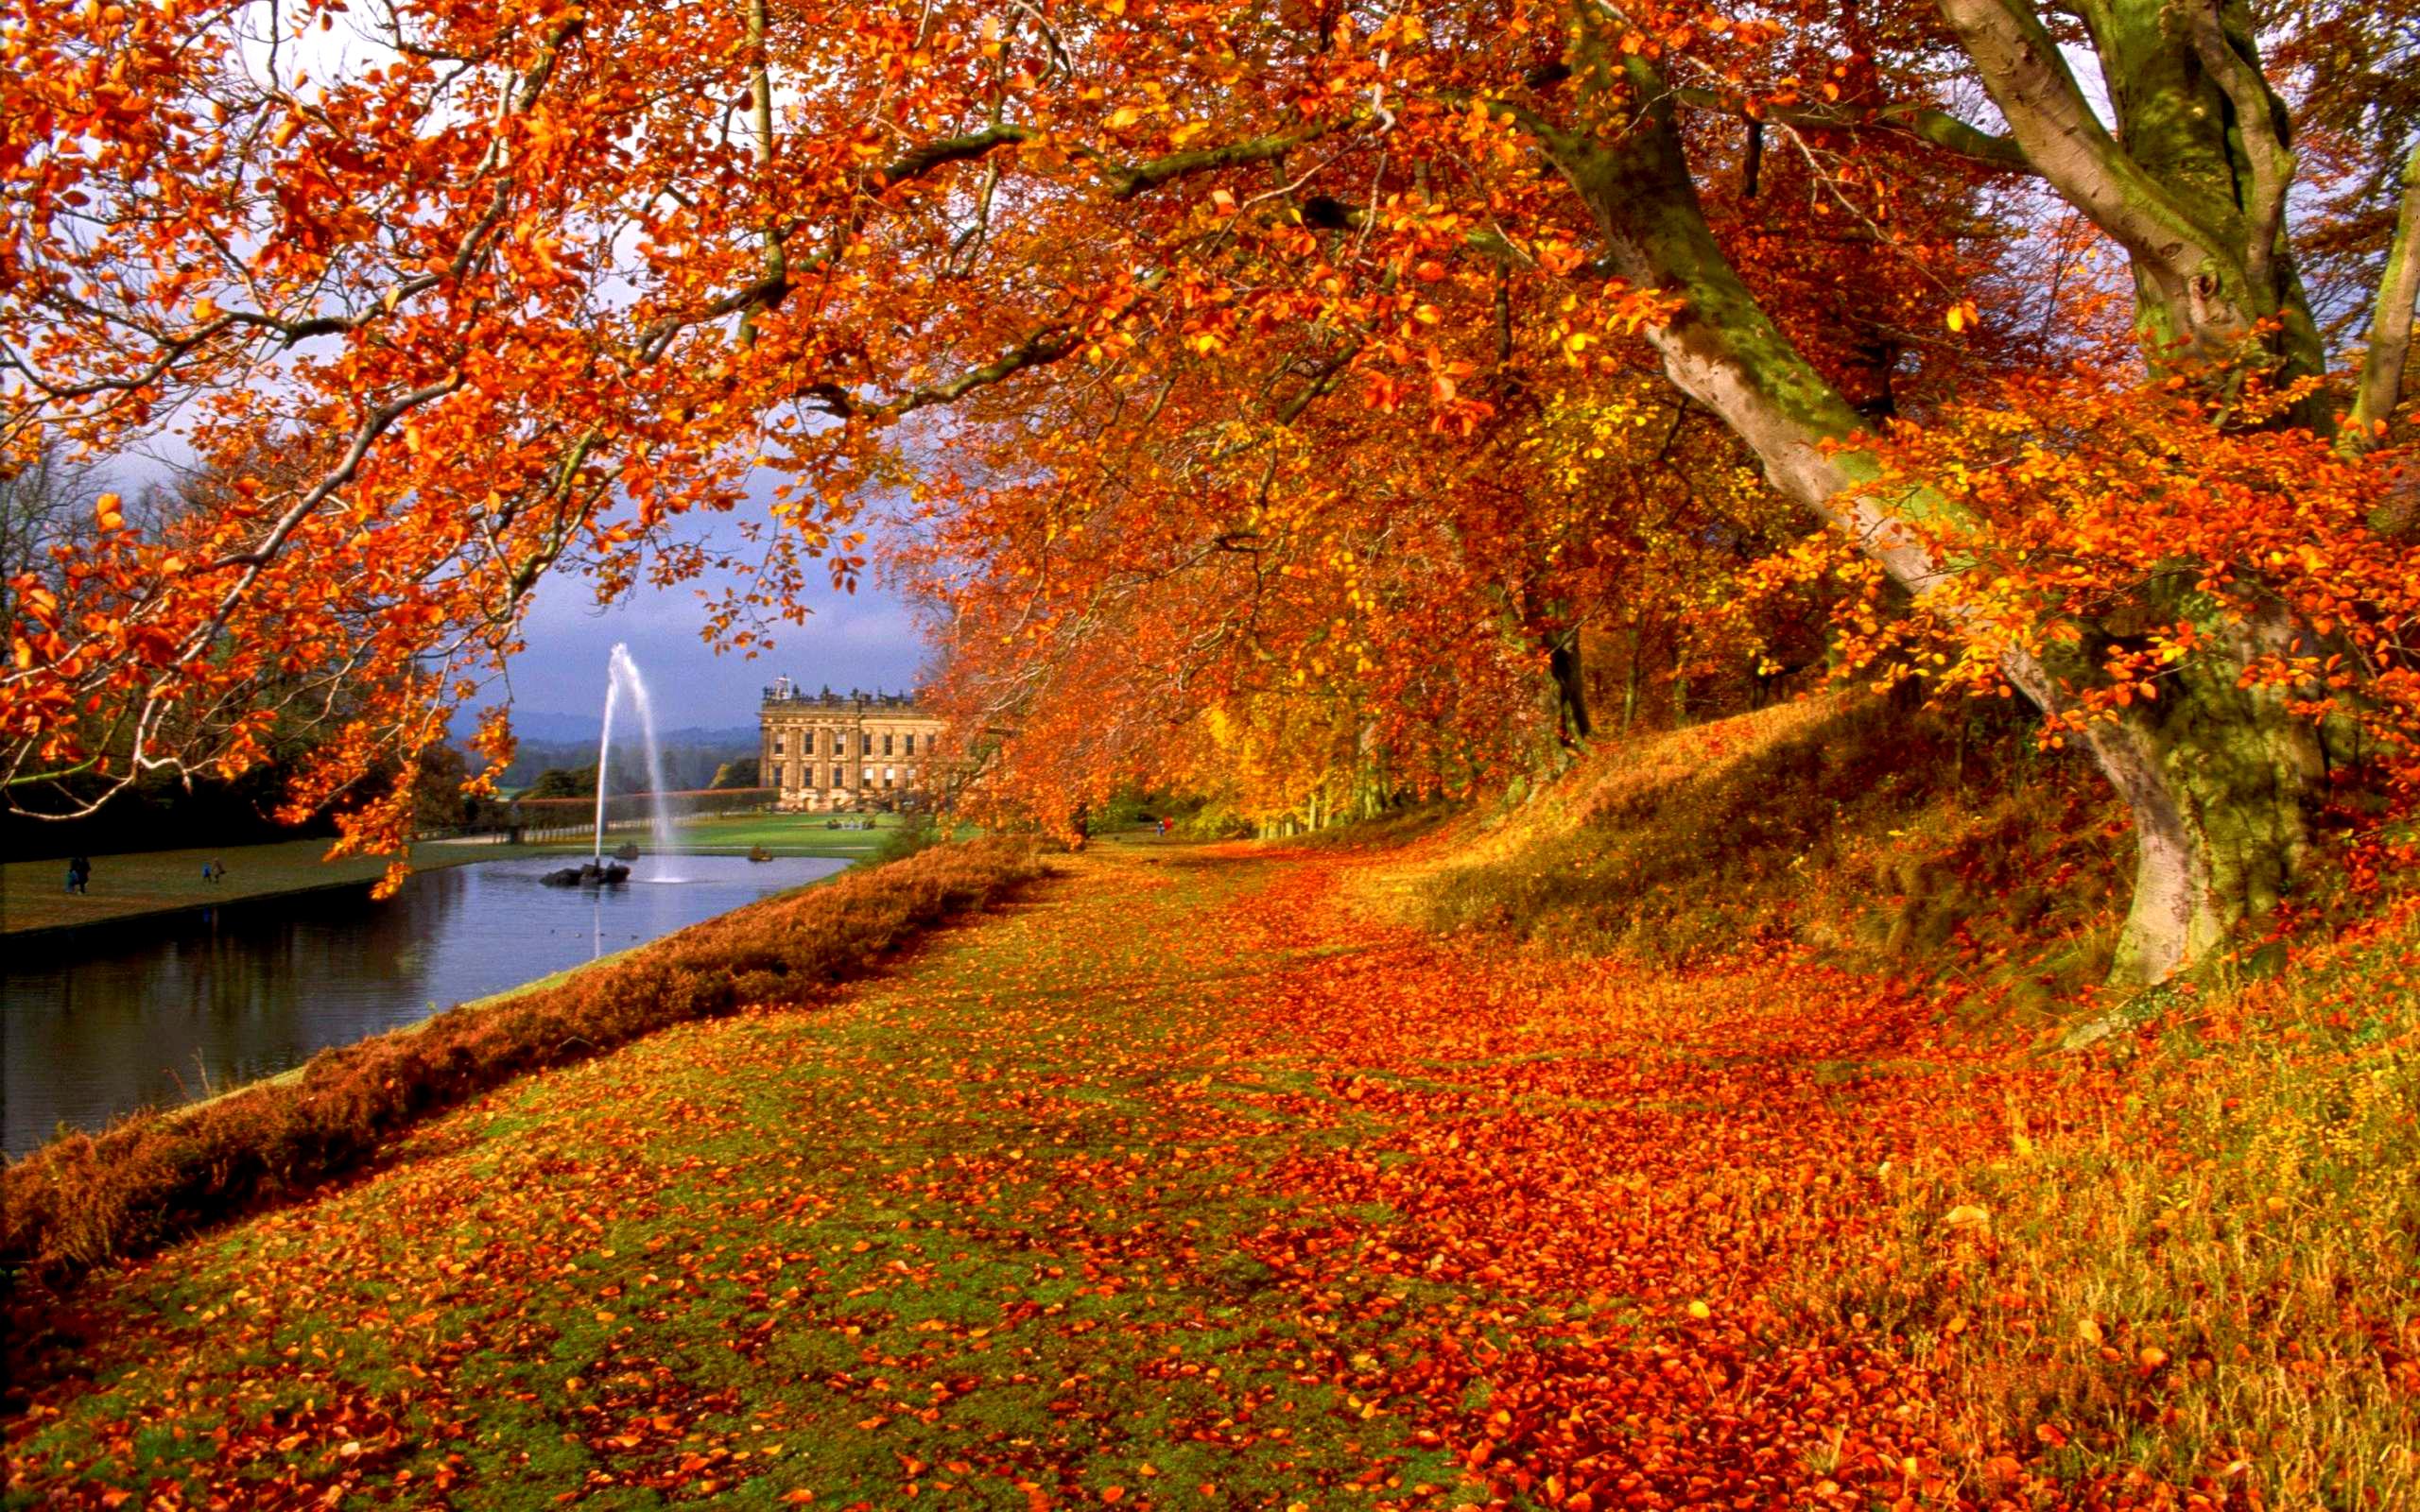 autumn wallpaper background 2560x1600